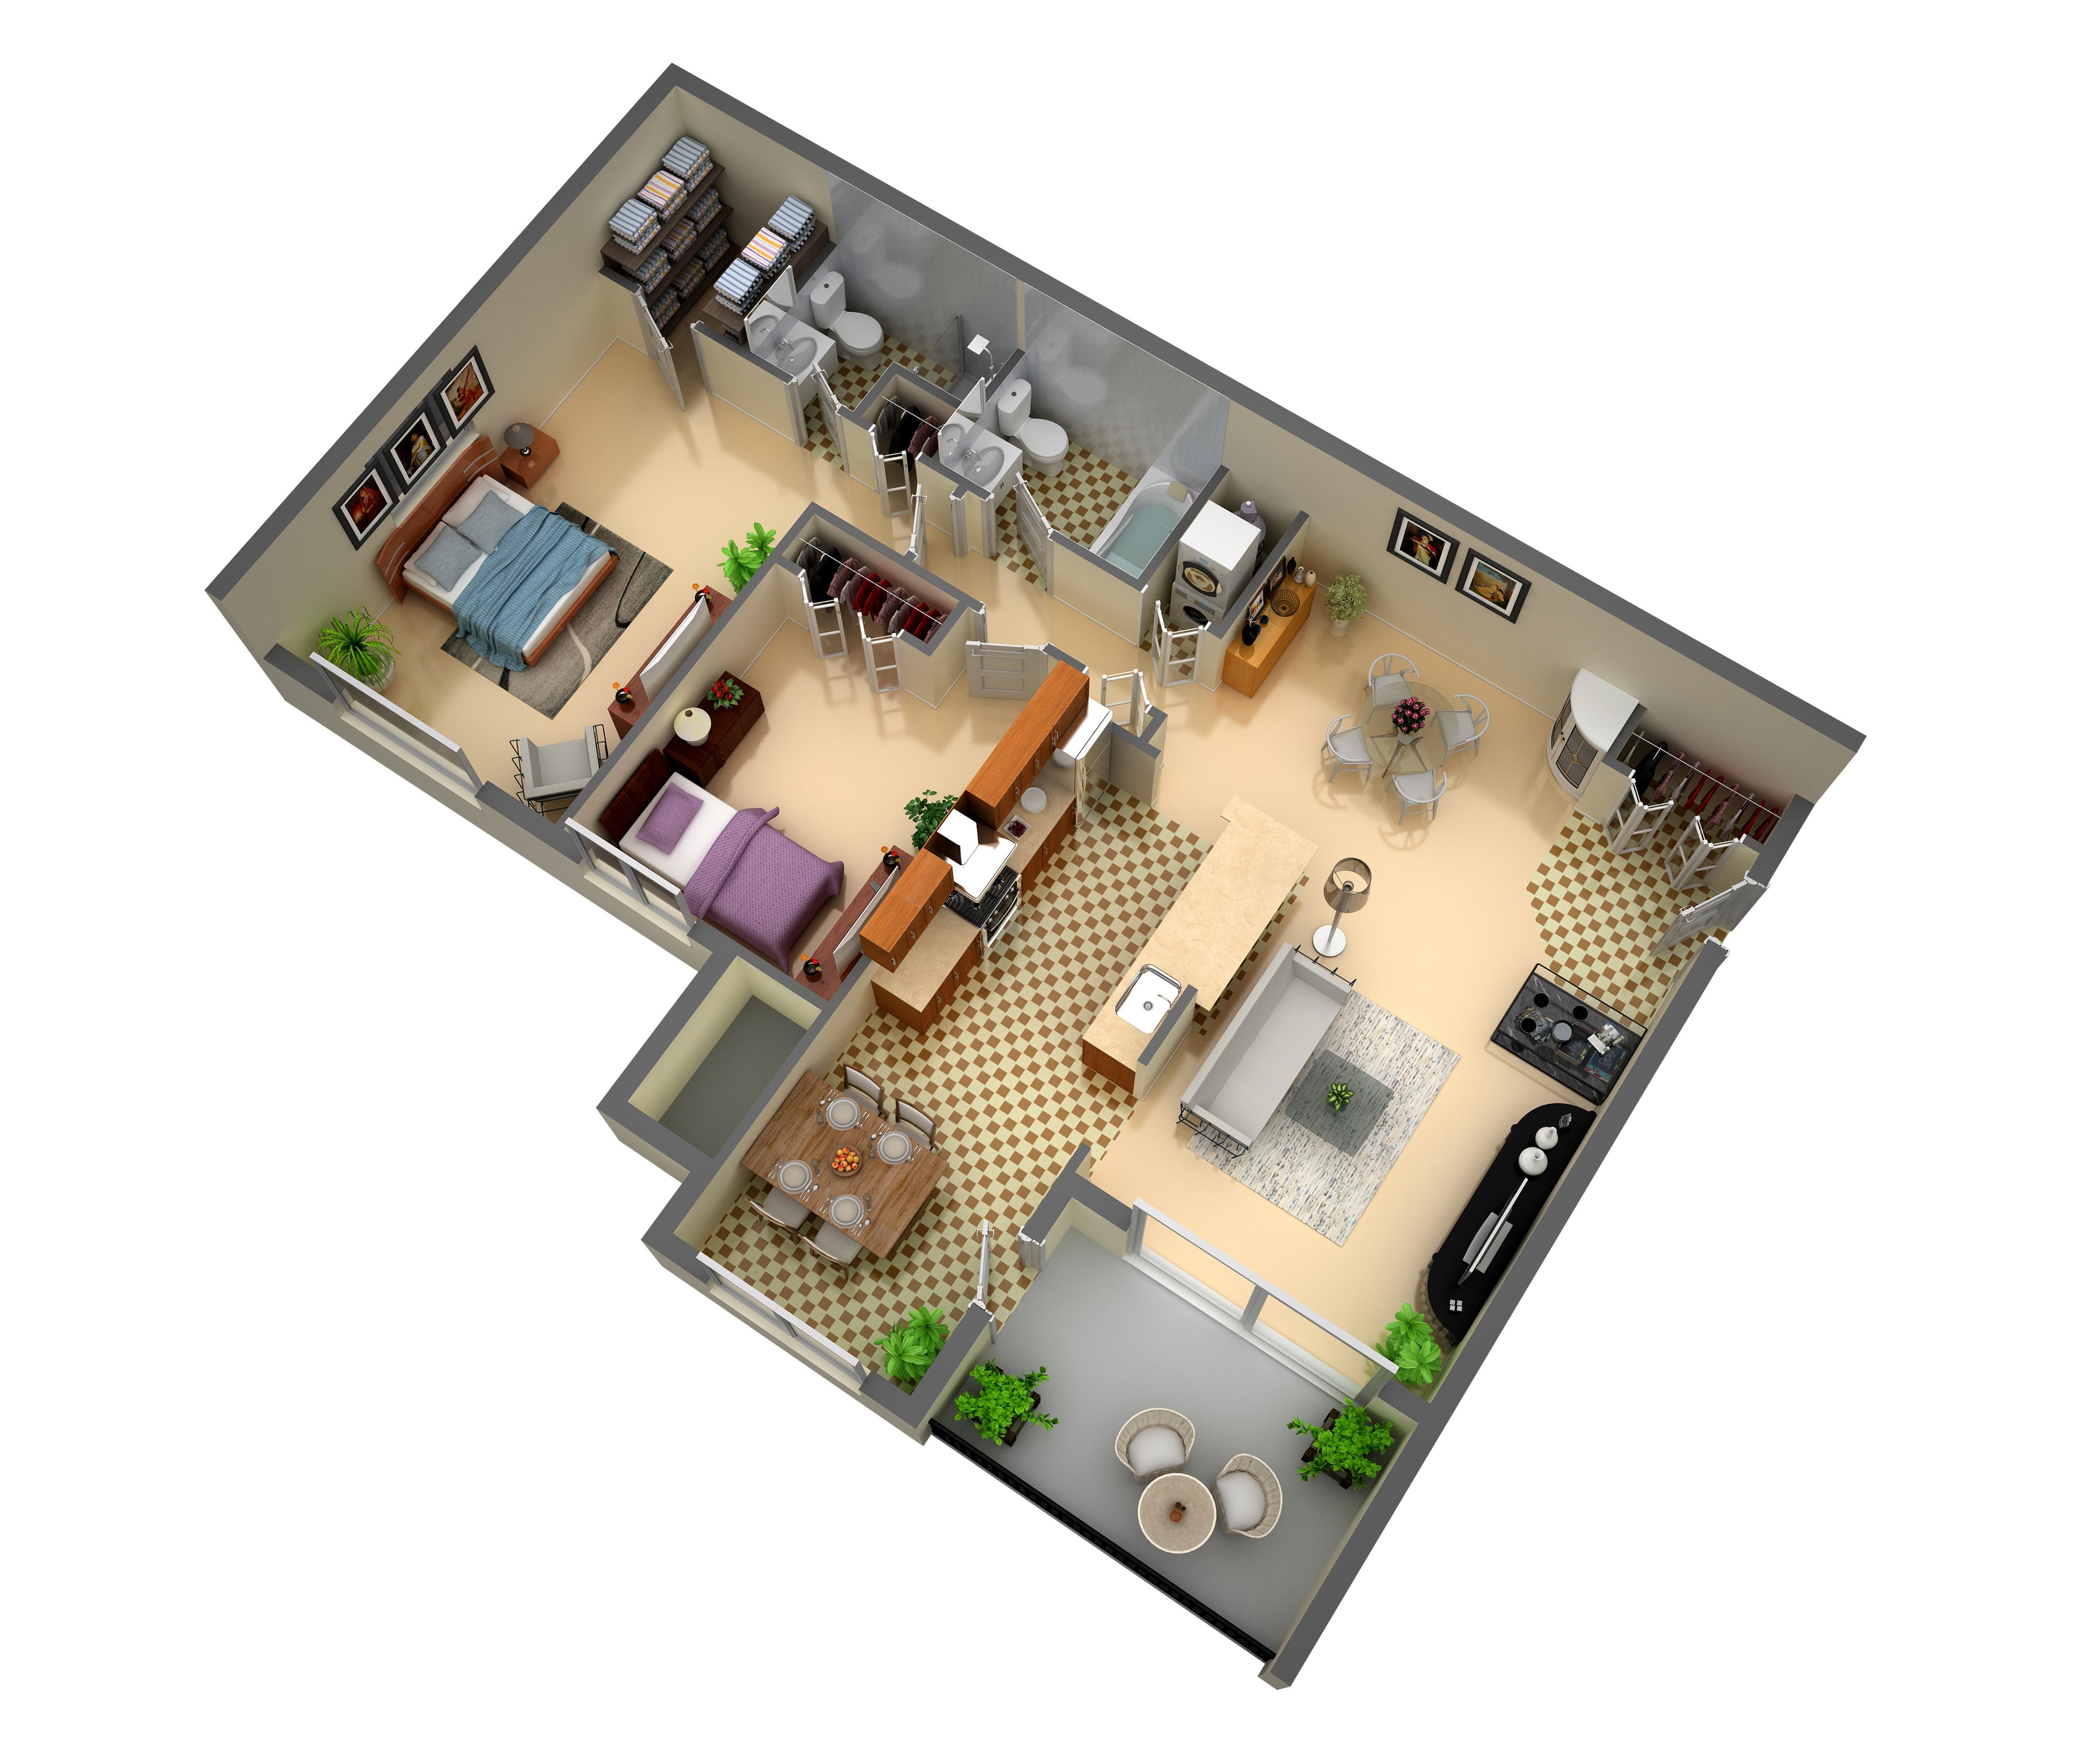 2 Bedroom 2 Bathrooms with breakfast bar